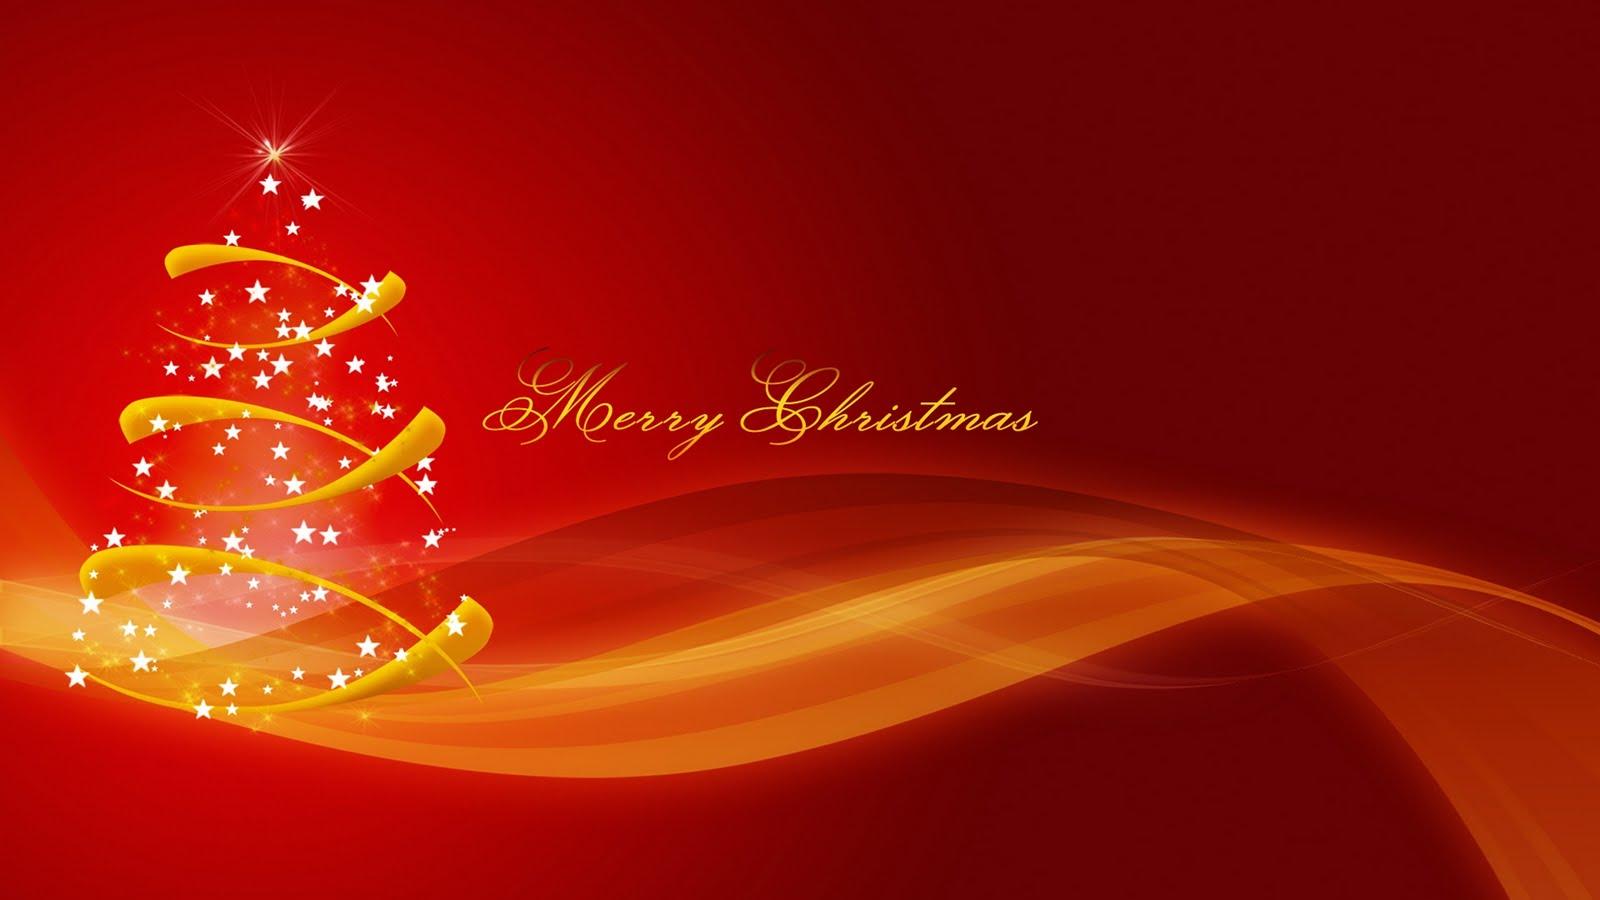 Darcy cruz merry christmas wallpaper hd - Christmas wallpaper hd for desktop ...